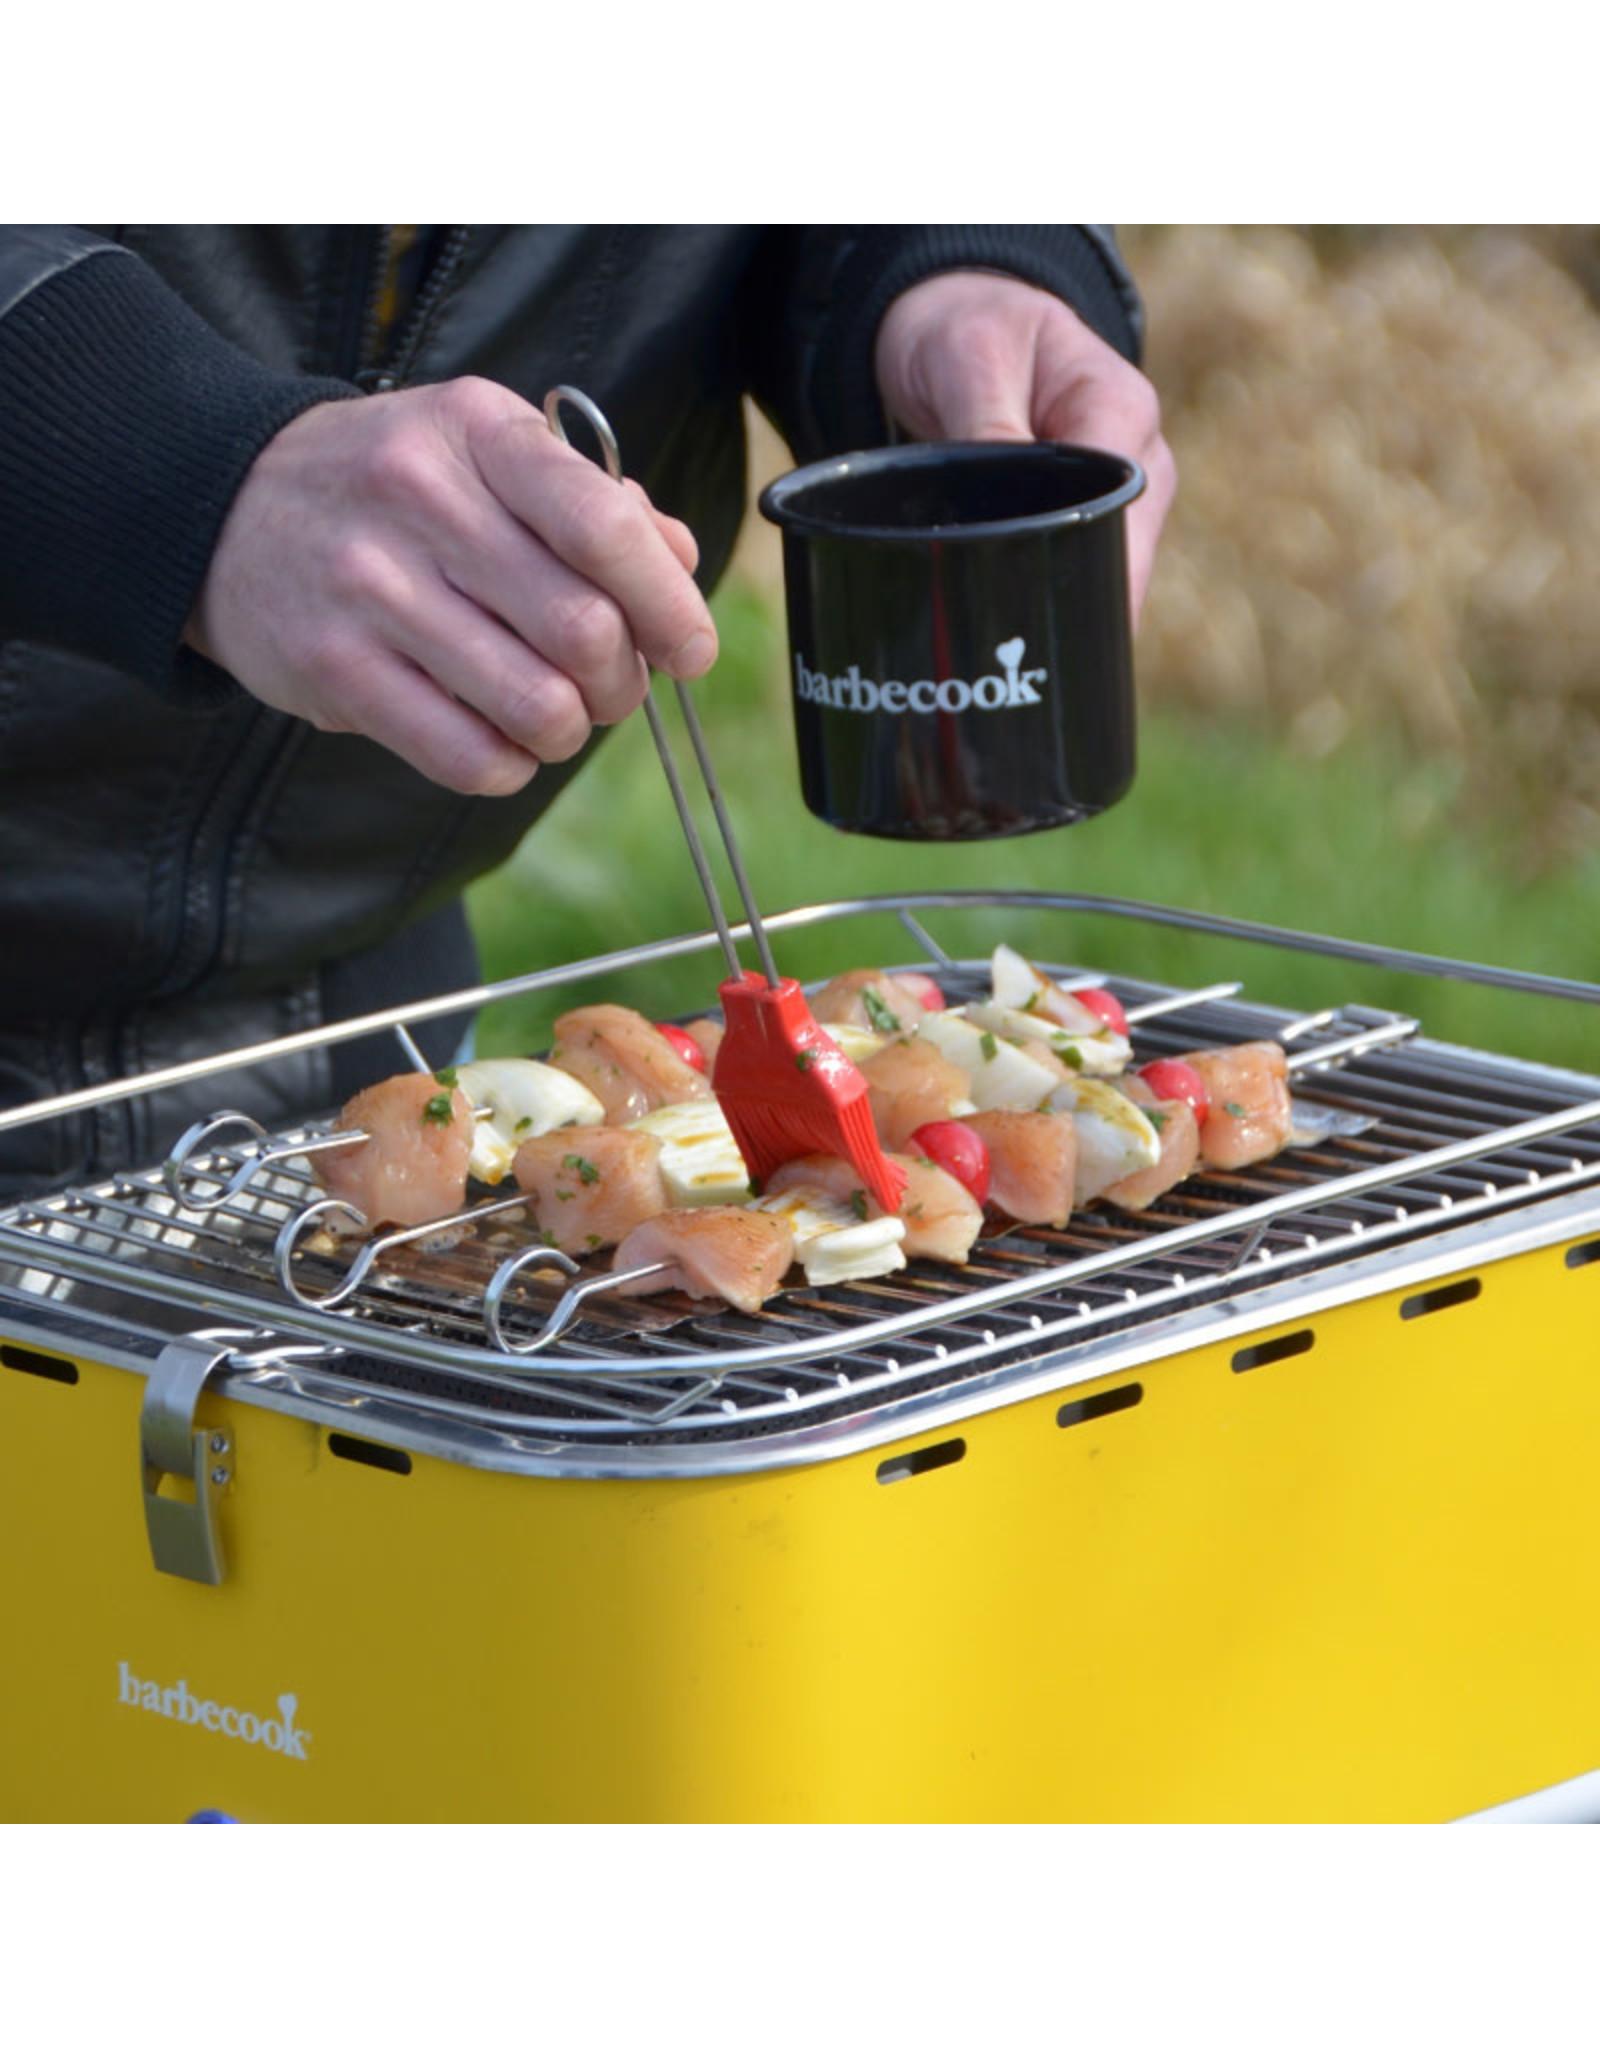 Barbecook Barbecook tafelbarbecue CARLO CHILI PEPPER ROOD